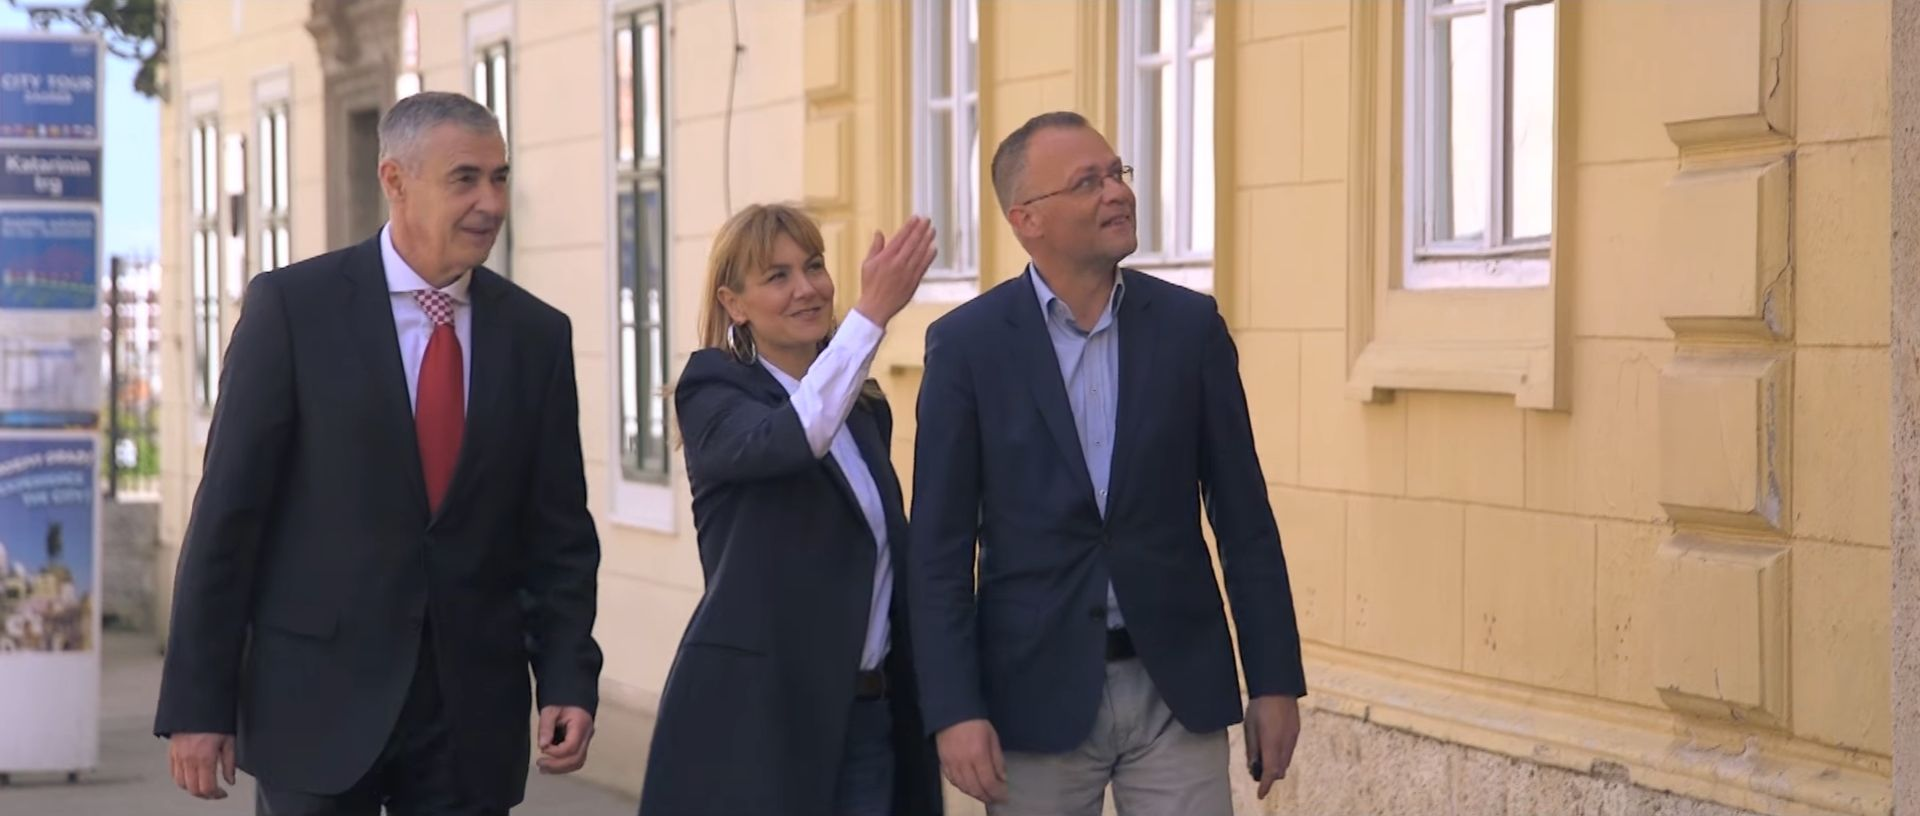 VIDEO: ZAGREB Esih, Glasnović i Hasanbegović snimili predizborni spot